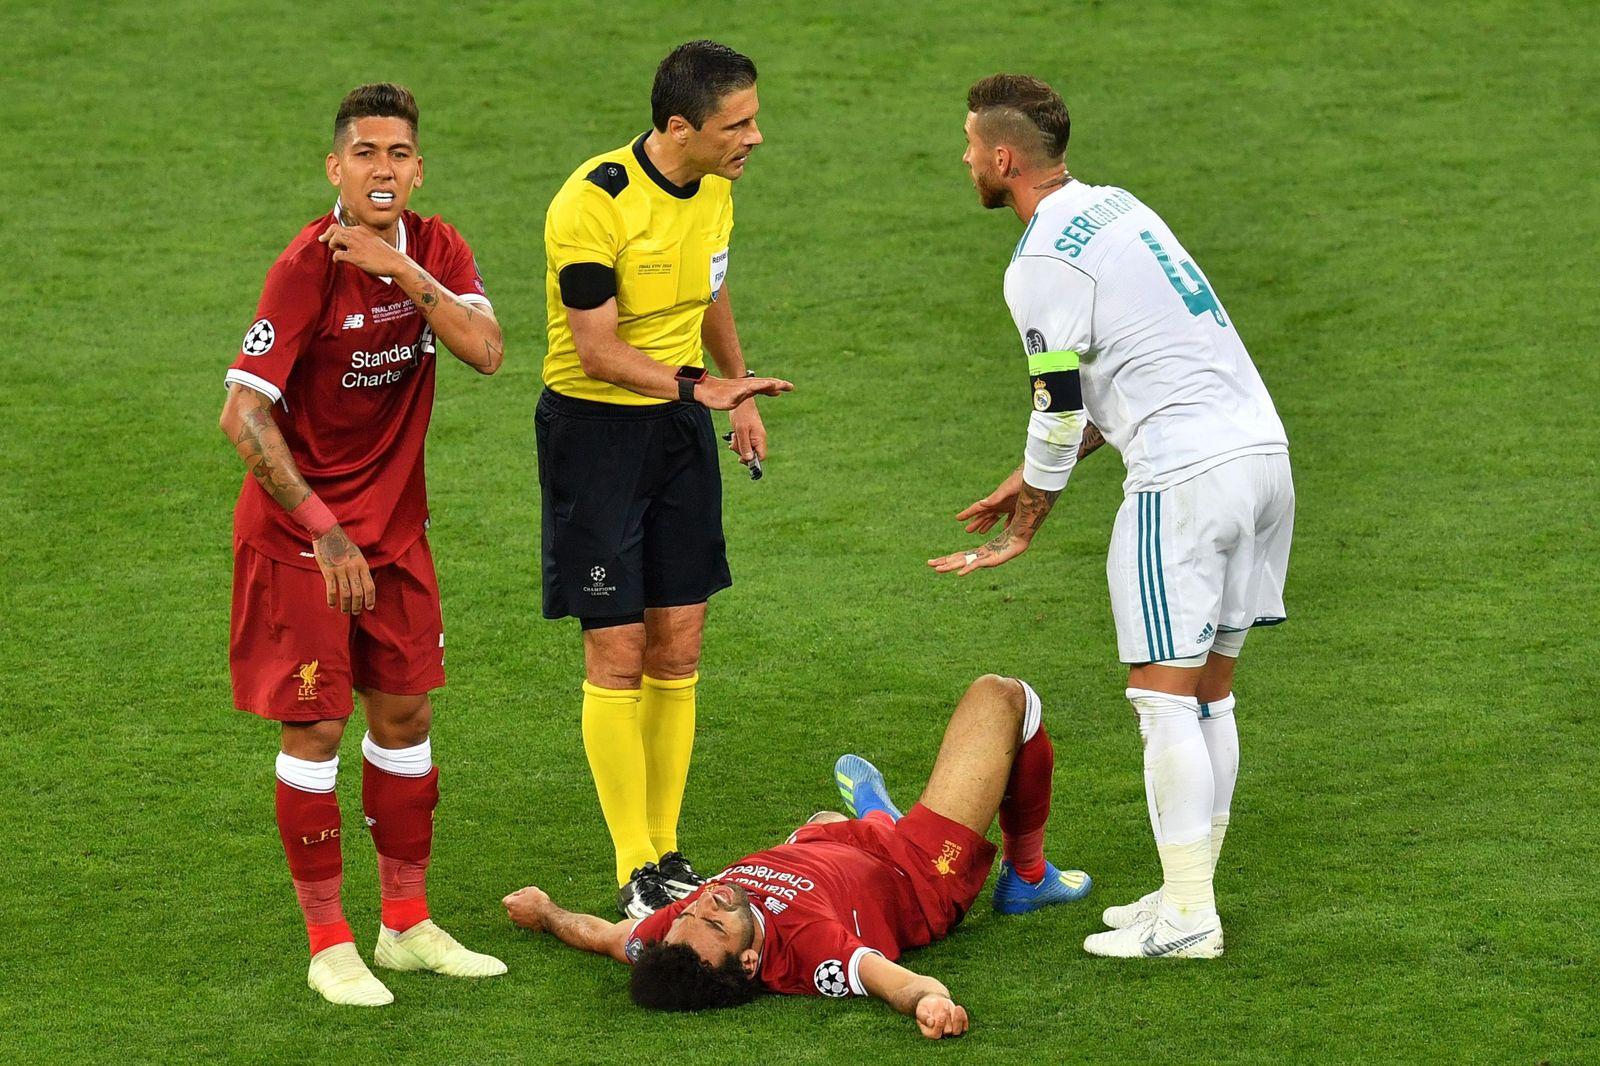 Sportbilder des Monats Mai 2018